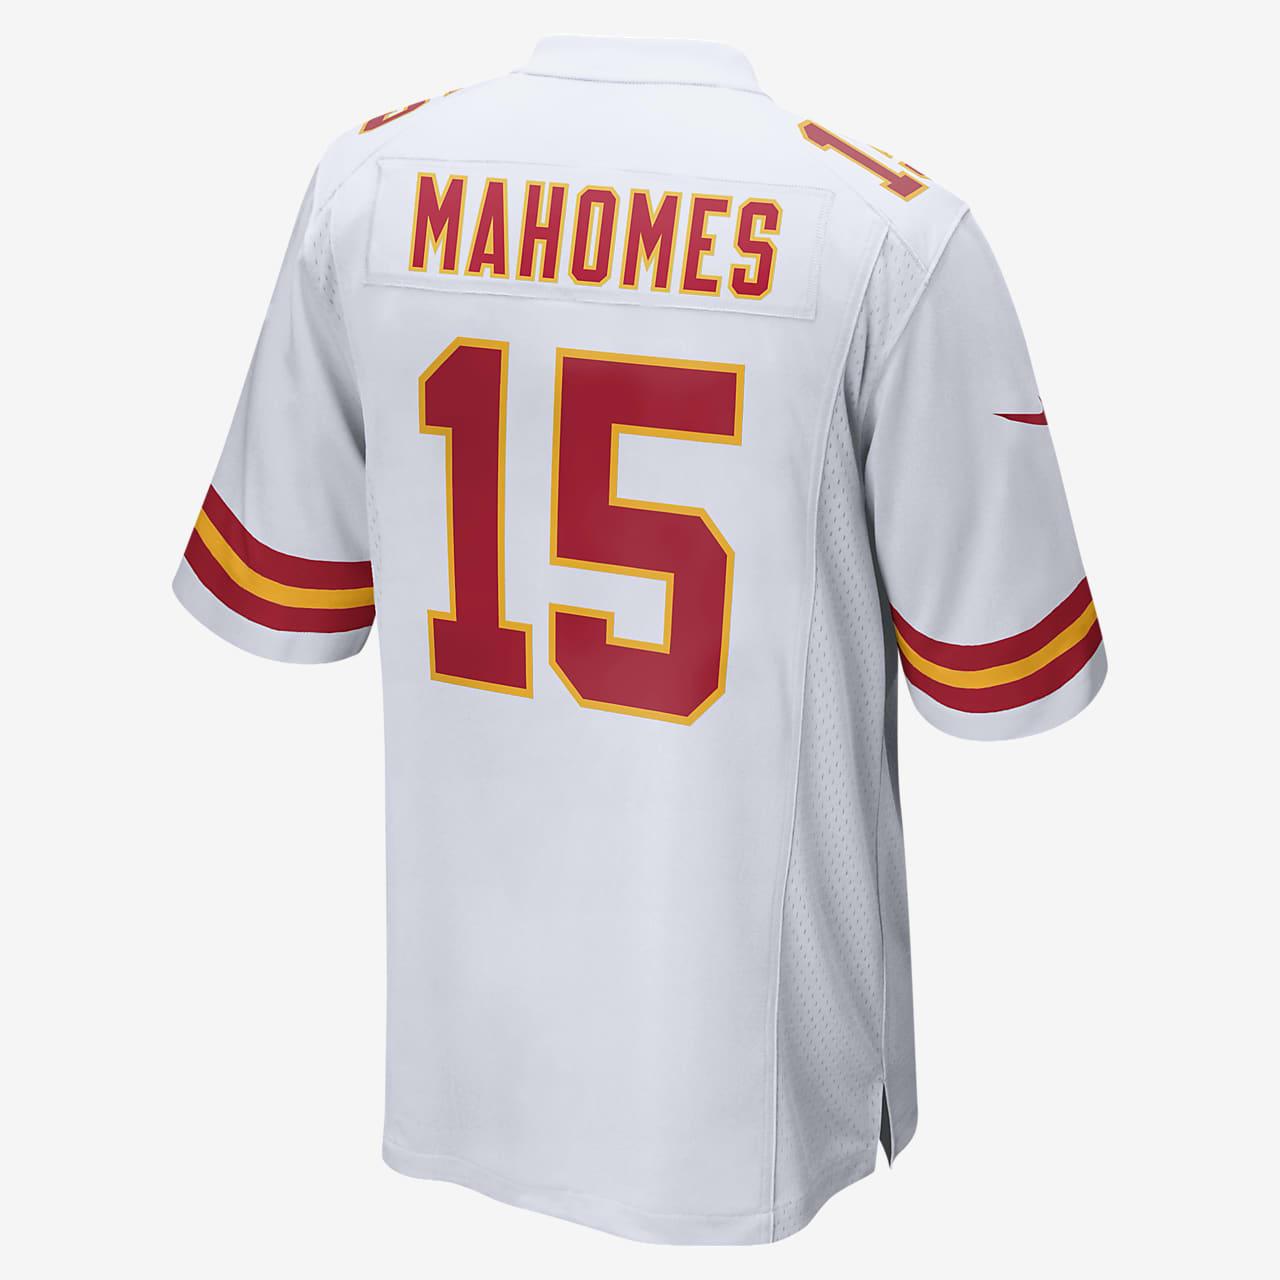 NBJBK Camiseta de de la NFL Hombres Kansas Chiefs # 15 Mahomes # 87# 10# 27# 29# 25 Camiseta Deportiva Deportiva de Manga Corta de f/útbol,B-15,M